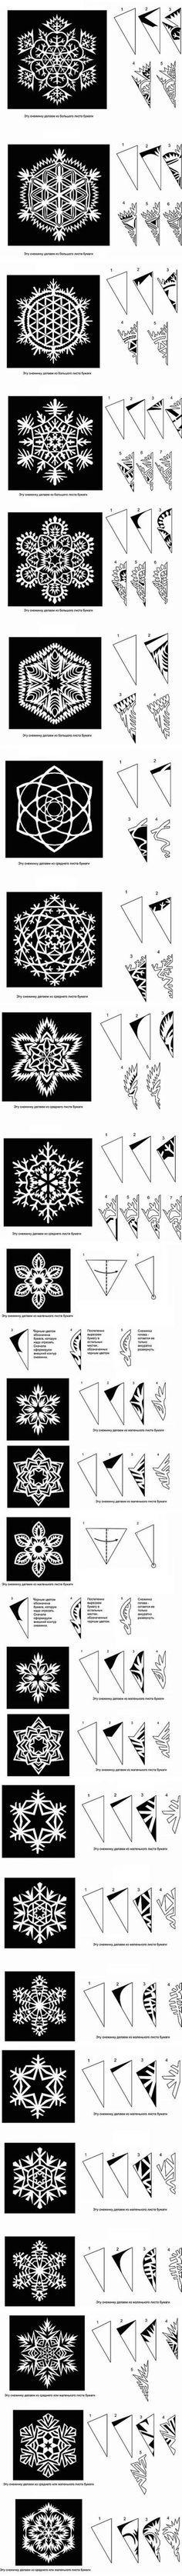 DIY Snowflakes Paper Patterns